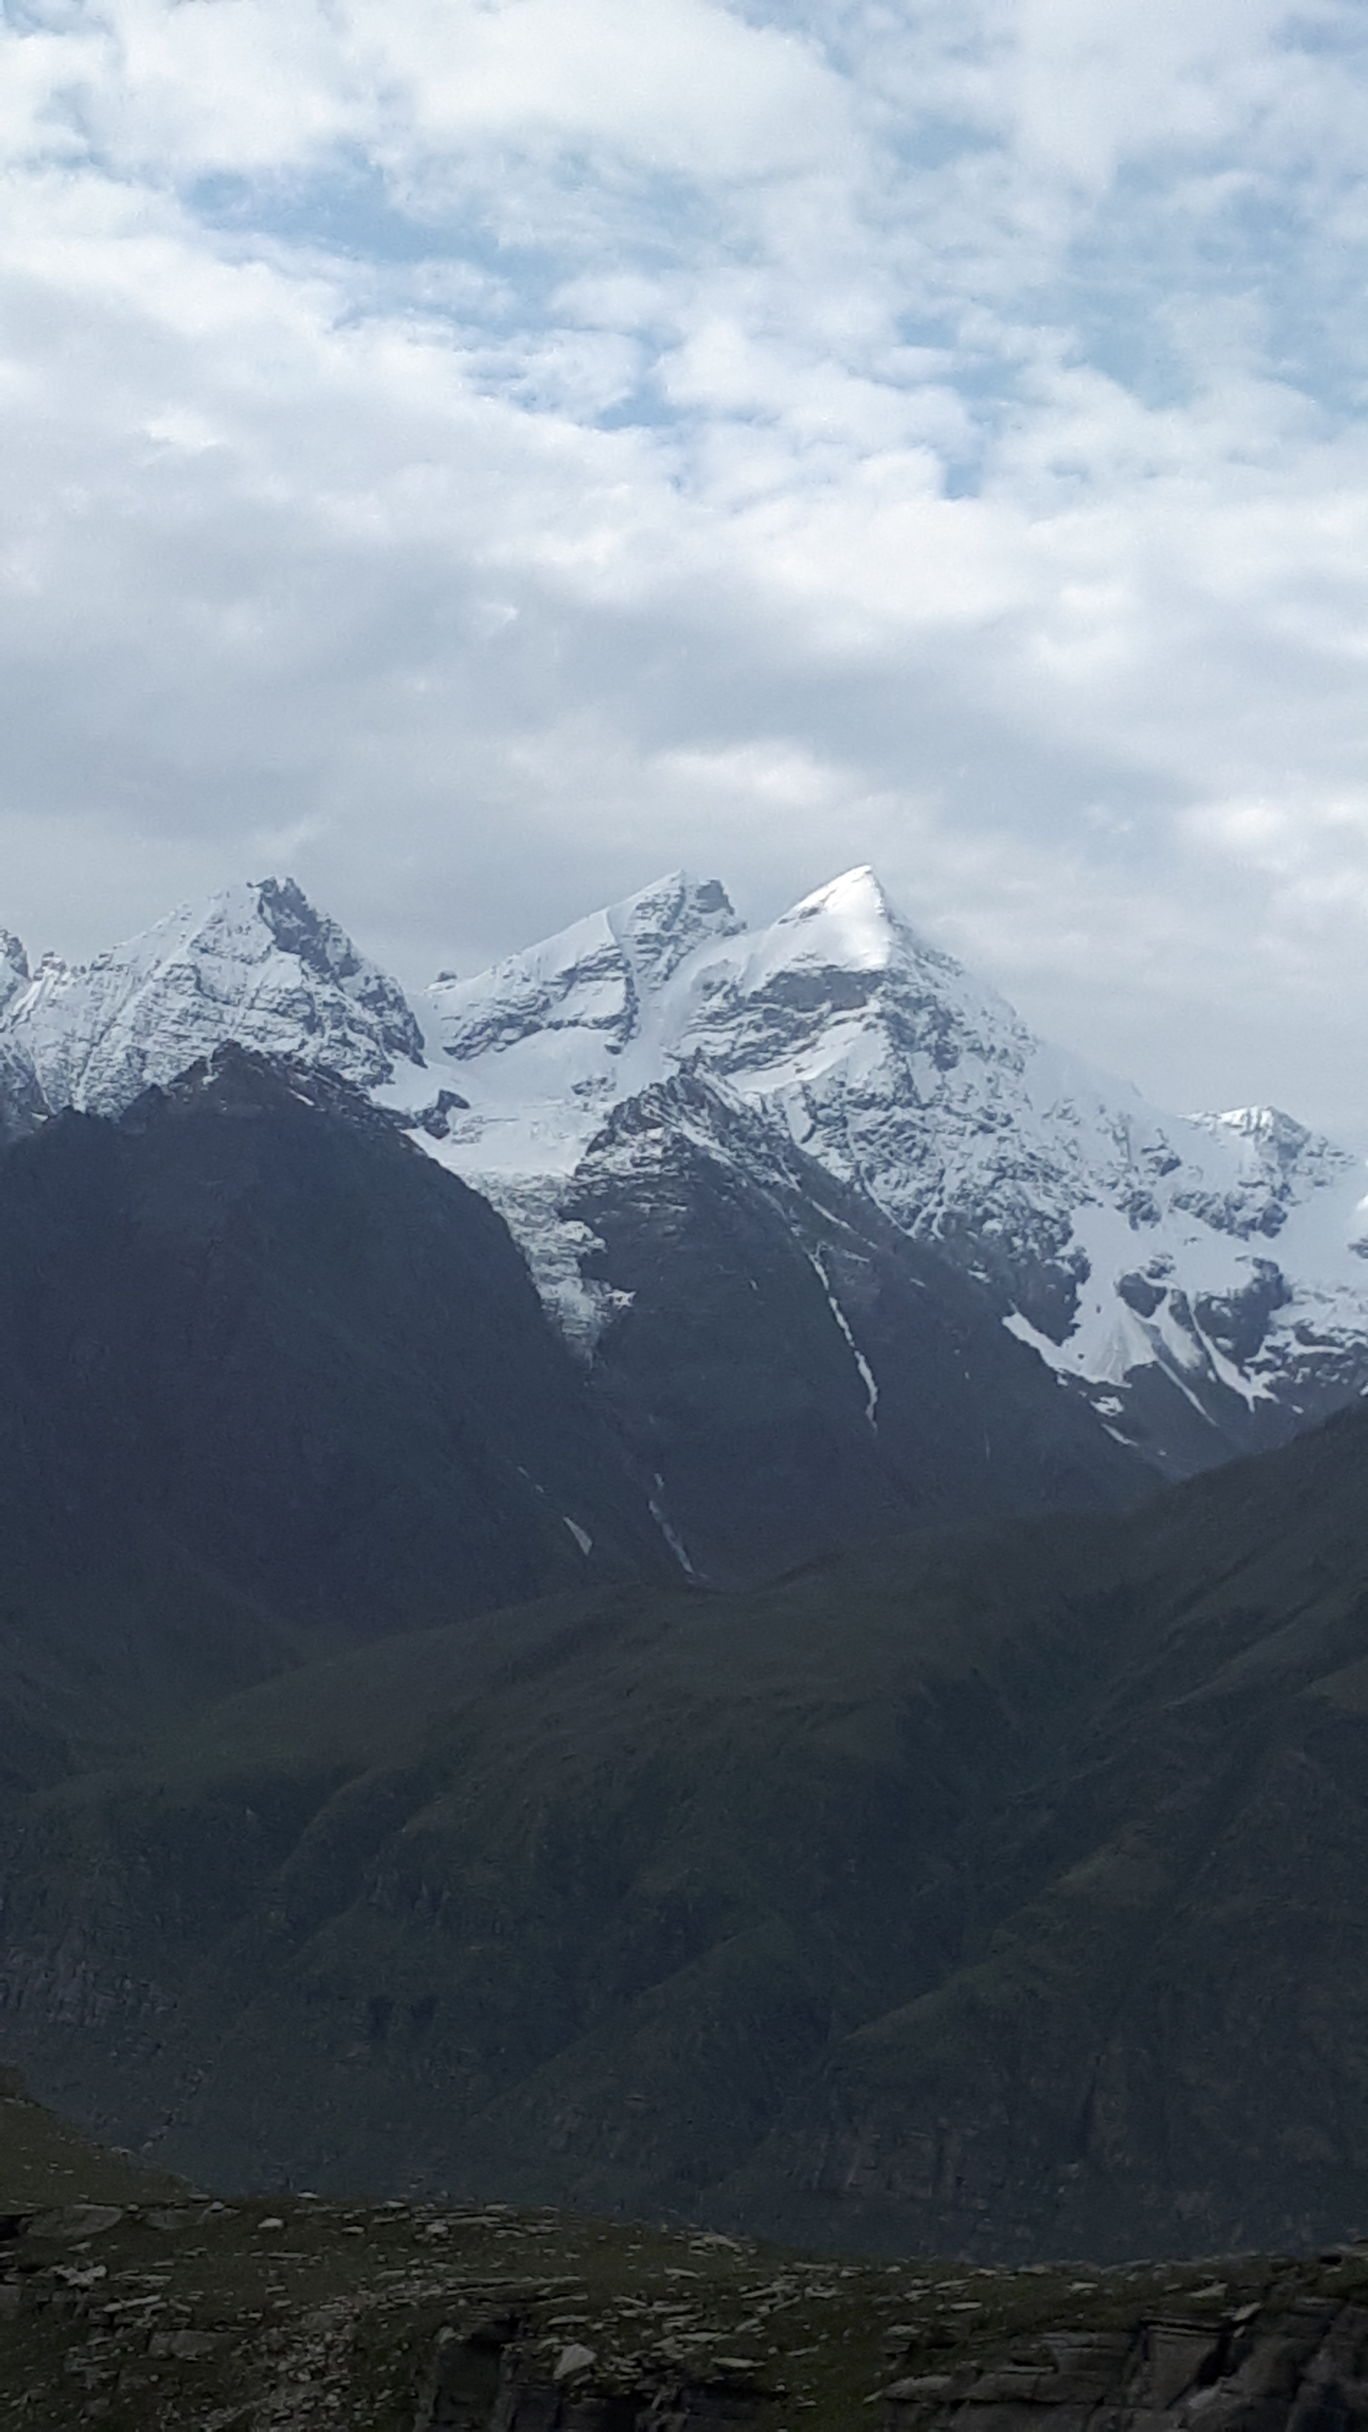 Photo of Rohtang Pass By Shashidharreddy Gutha